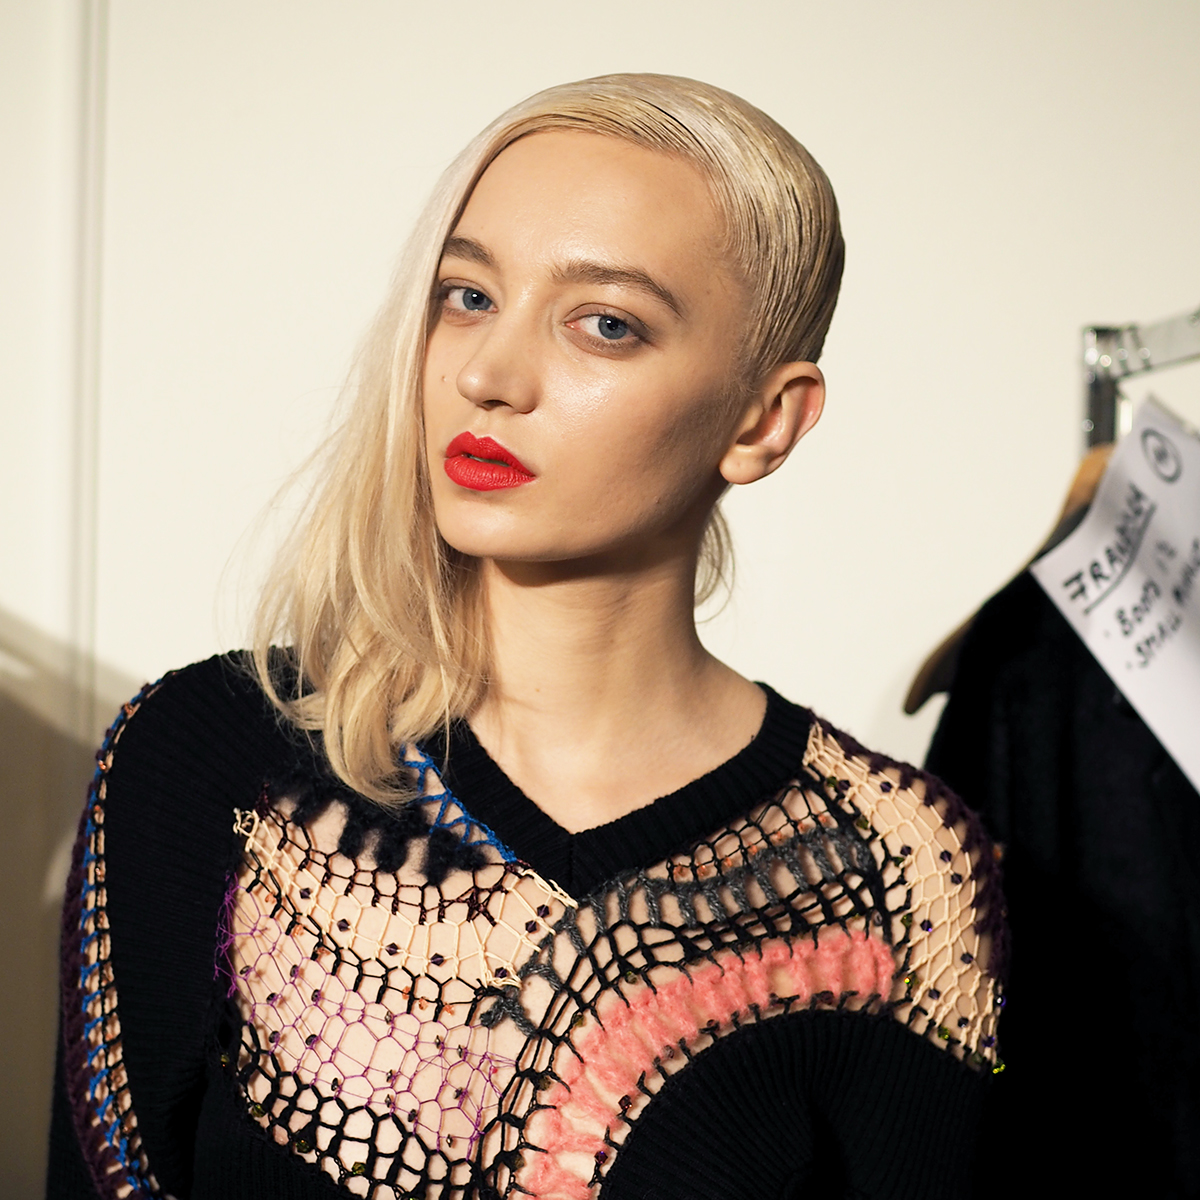 Augustin Teboul / Fashionweek Berlin / Foxycheeks